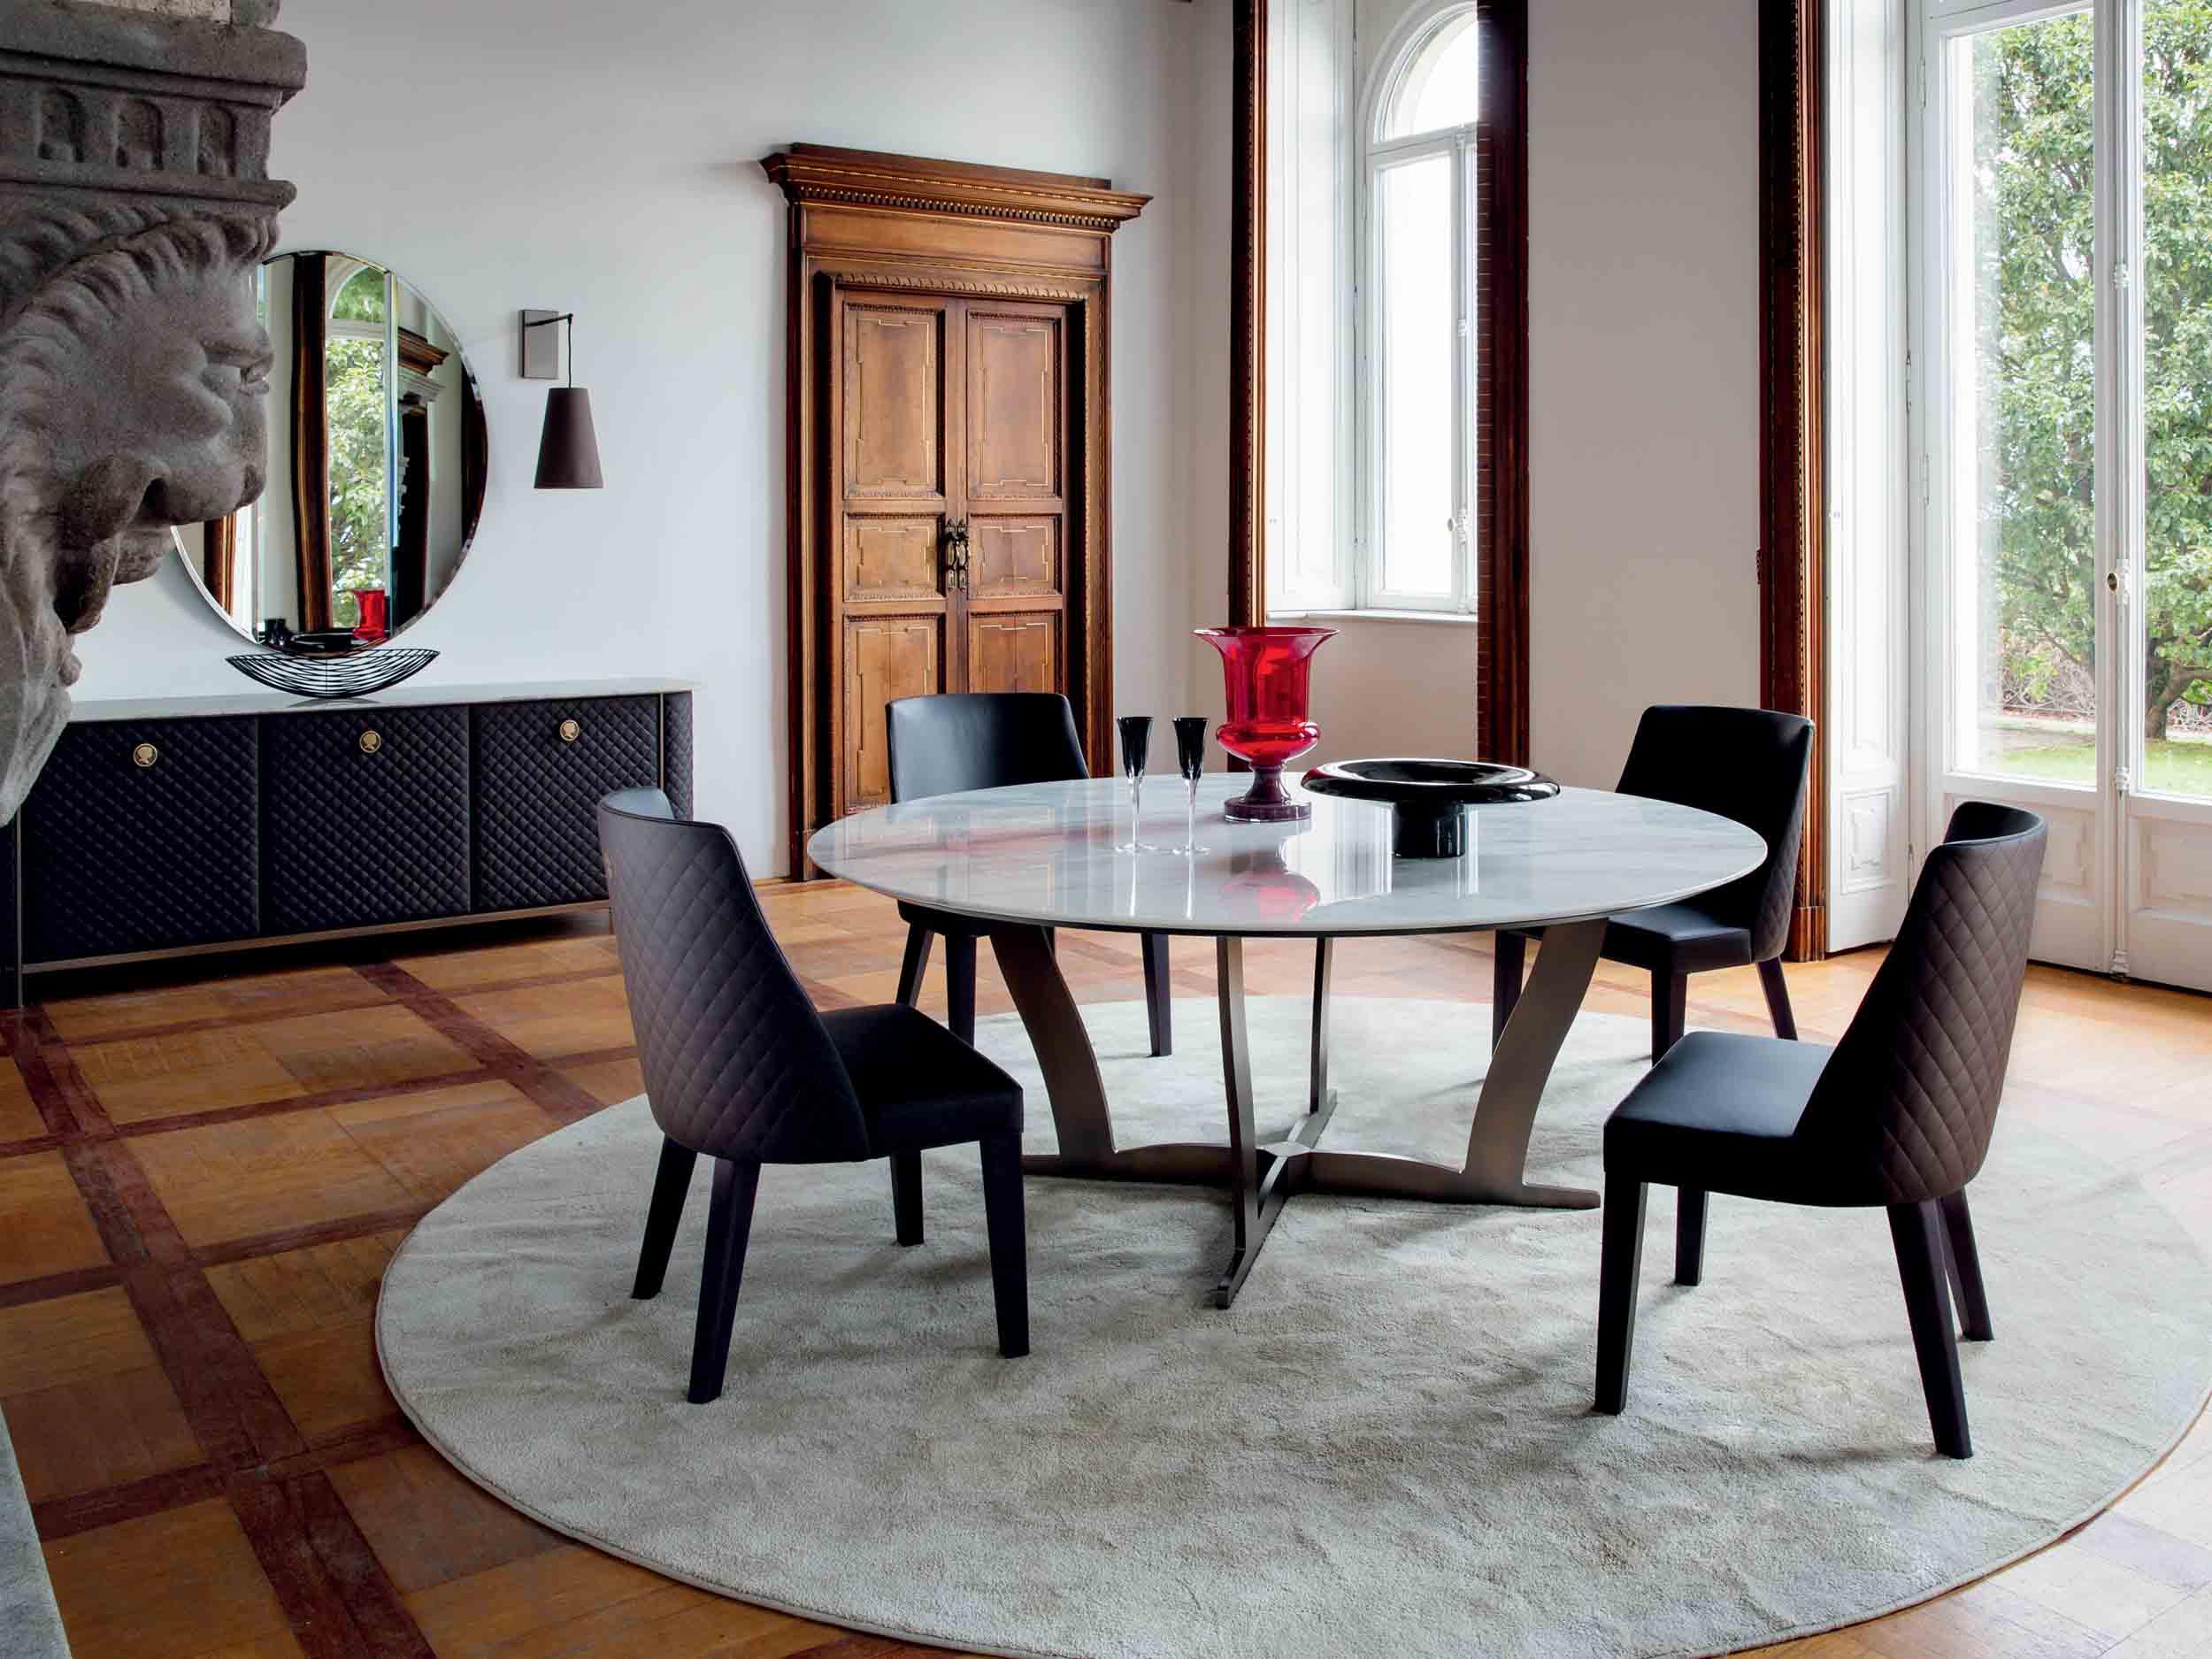 Bogart Dining Table + Ingrid Chair + Penelope Side Board